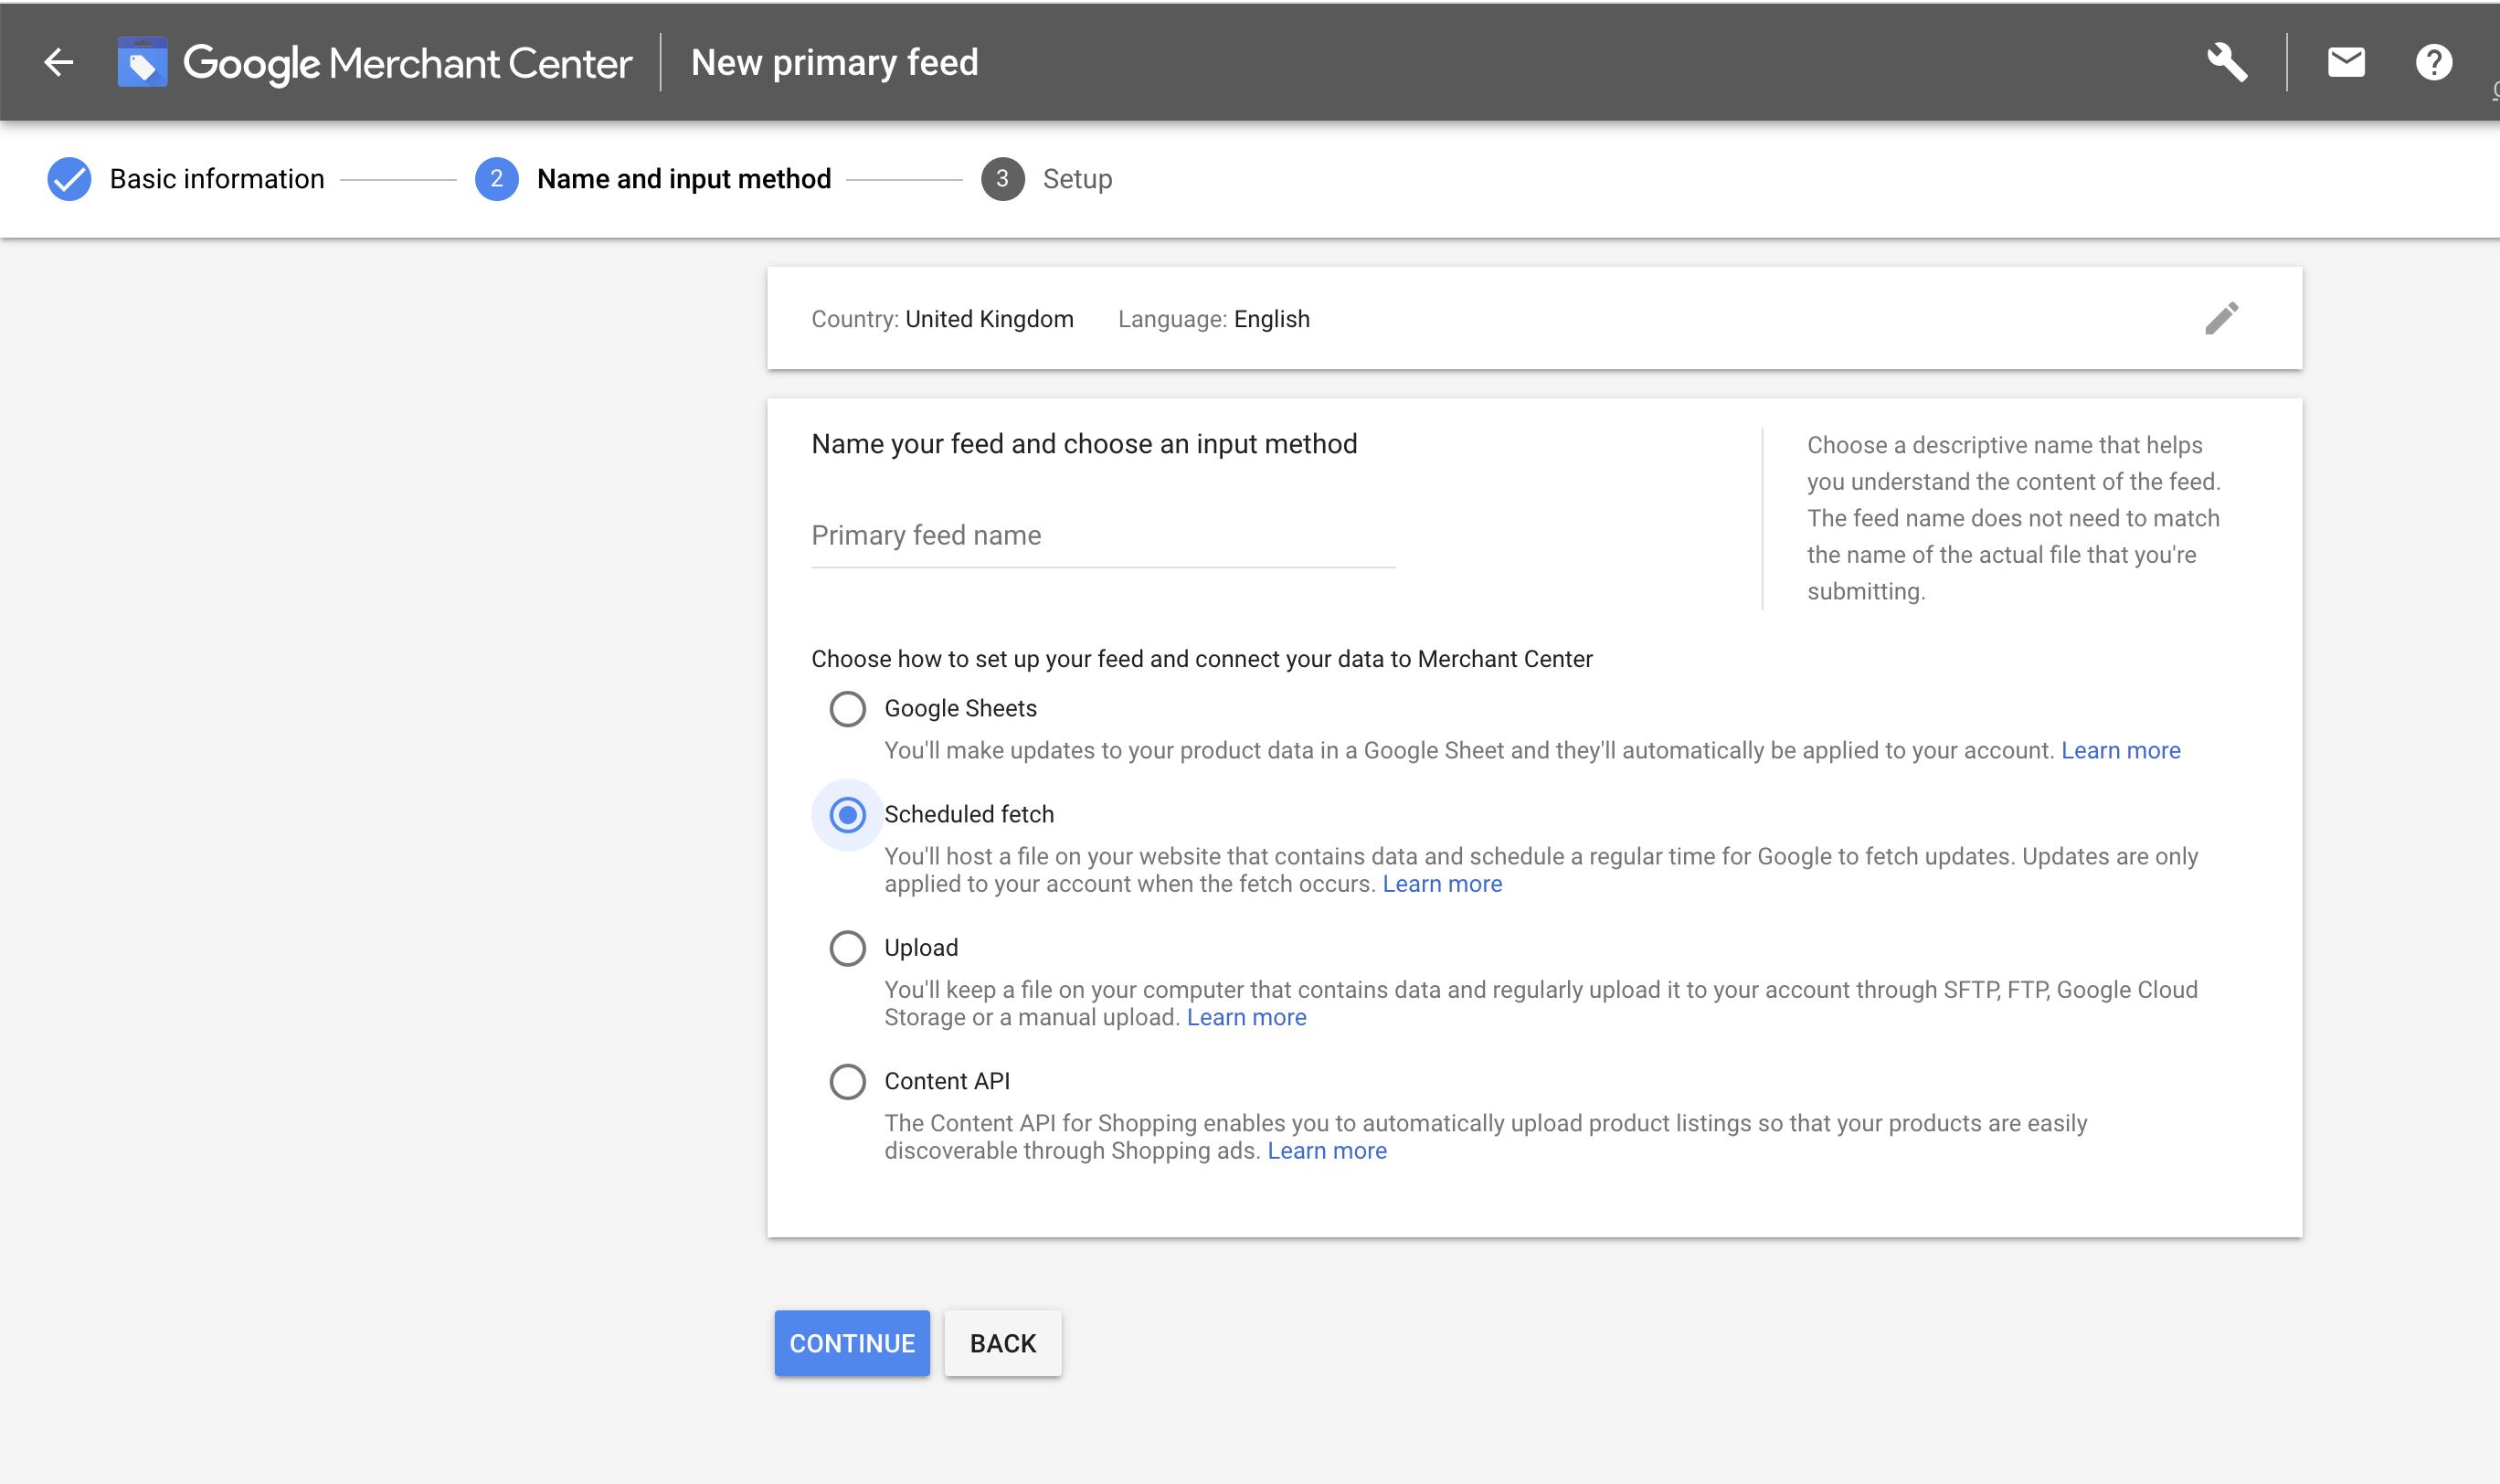 Google Feed Upload options